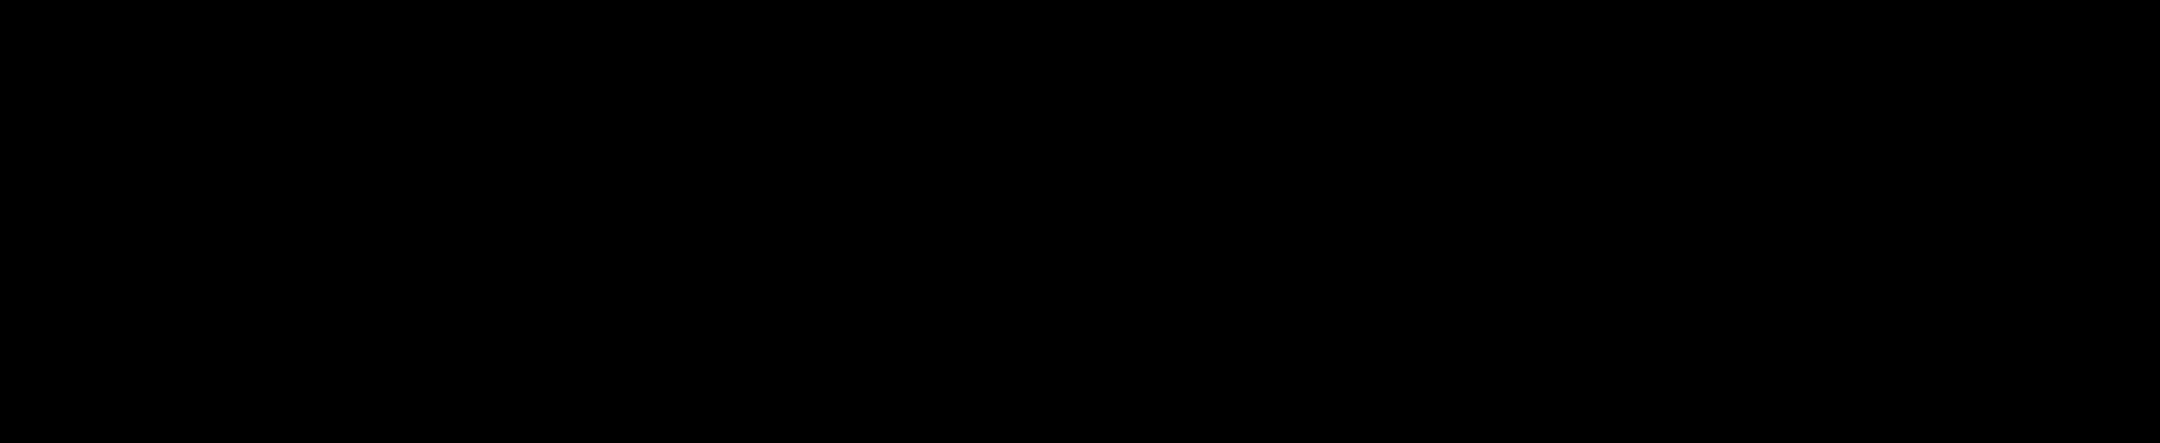 godaddy logo 1 1 - Godaddy Logo